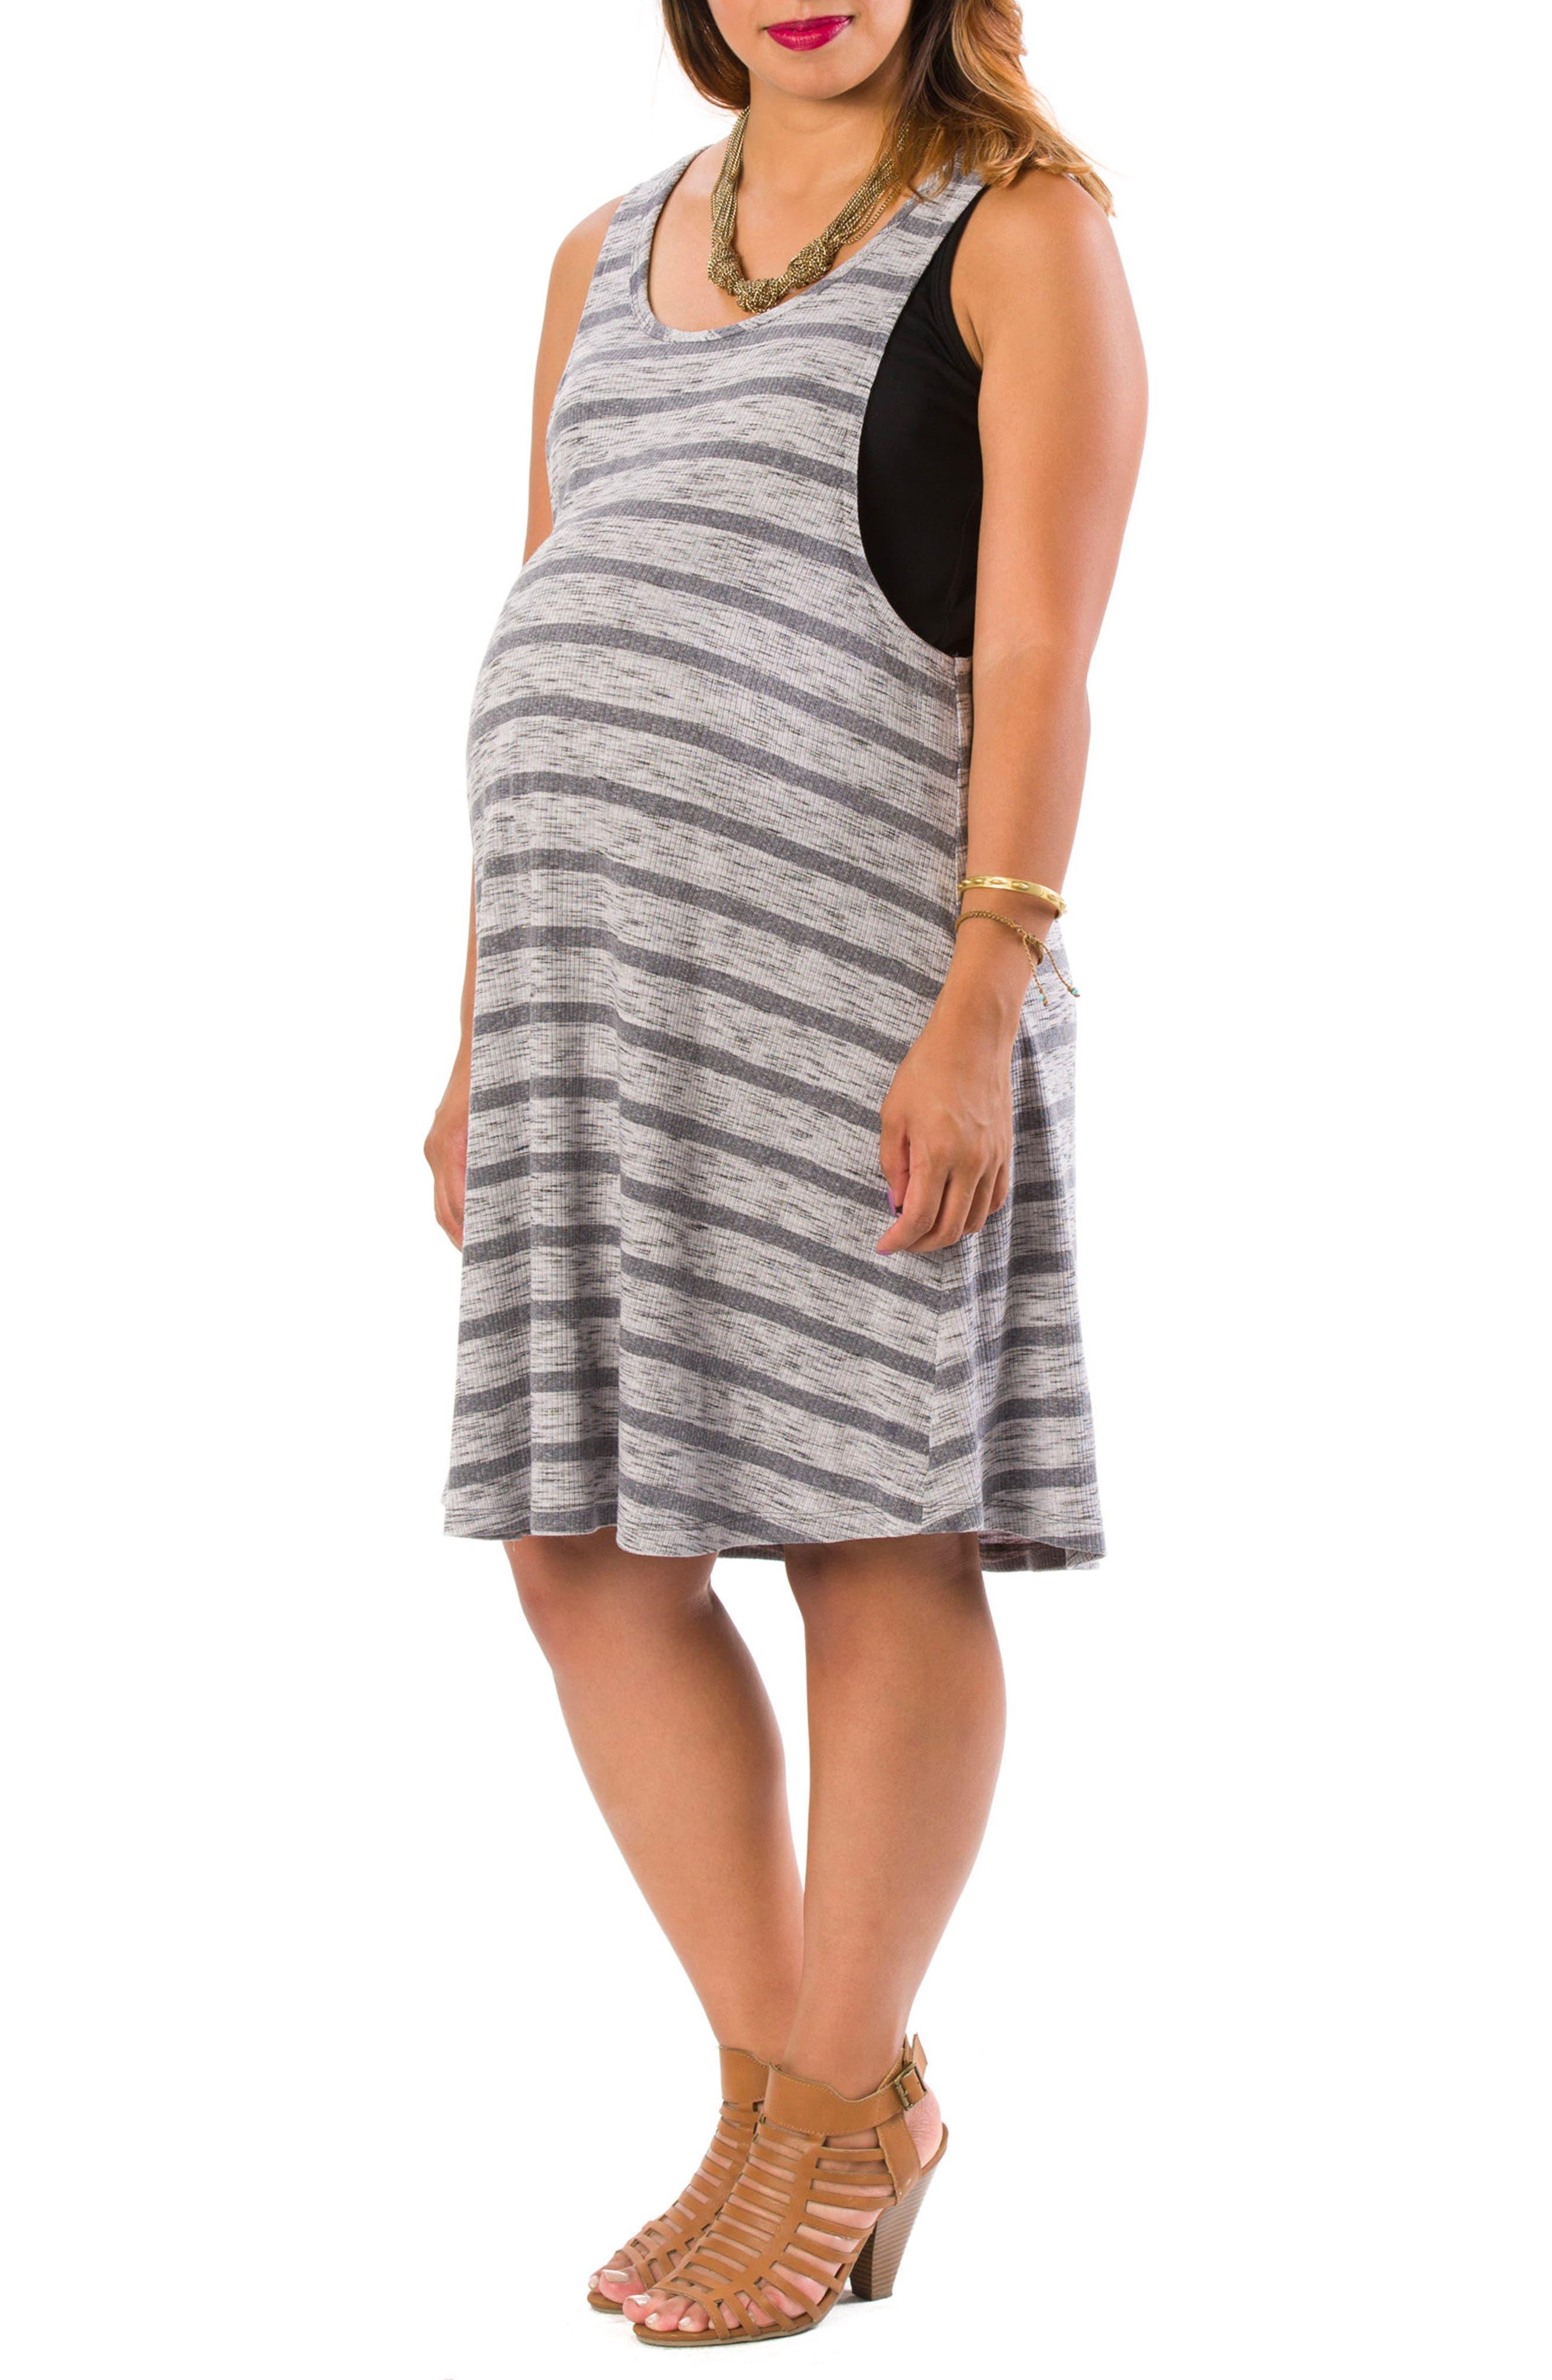 Danielle Maternity/Nursing Tank Dress,                             Main thumbnail 1, color,                             Gray Stripe W/ Black